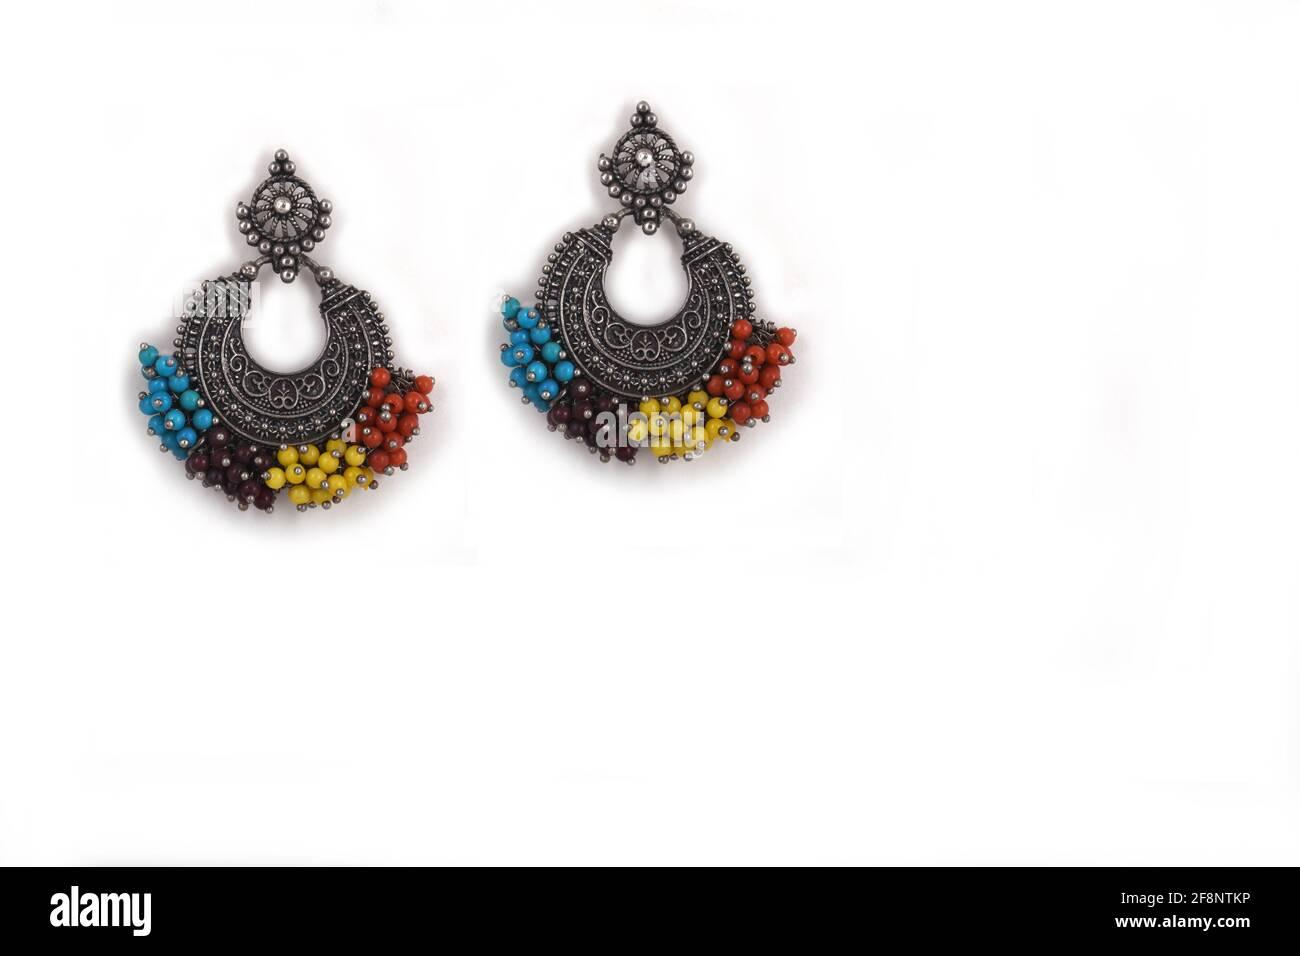 Silver Oxidized Earrings Ethnic Indian Style, Stylish With multicolored Beads, Jhumka Earrings, Dangle Drop Stud Earrings Stock Photo